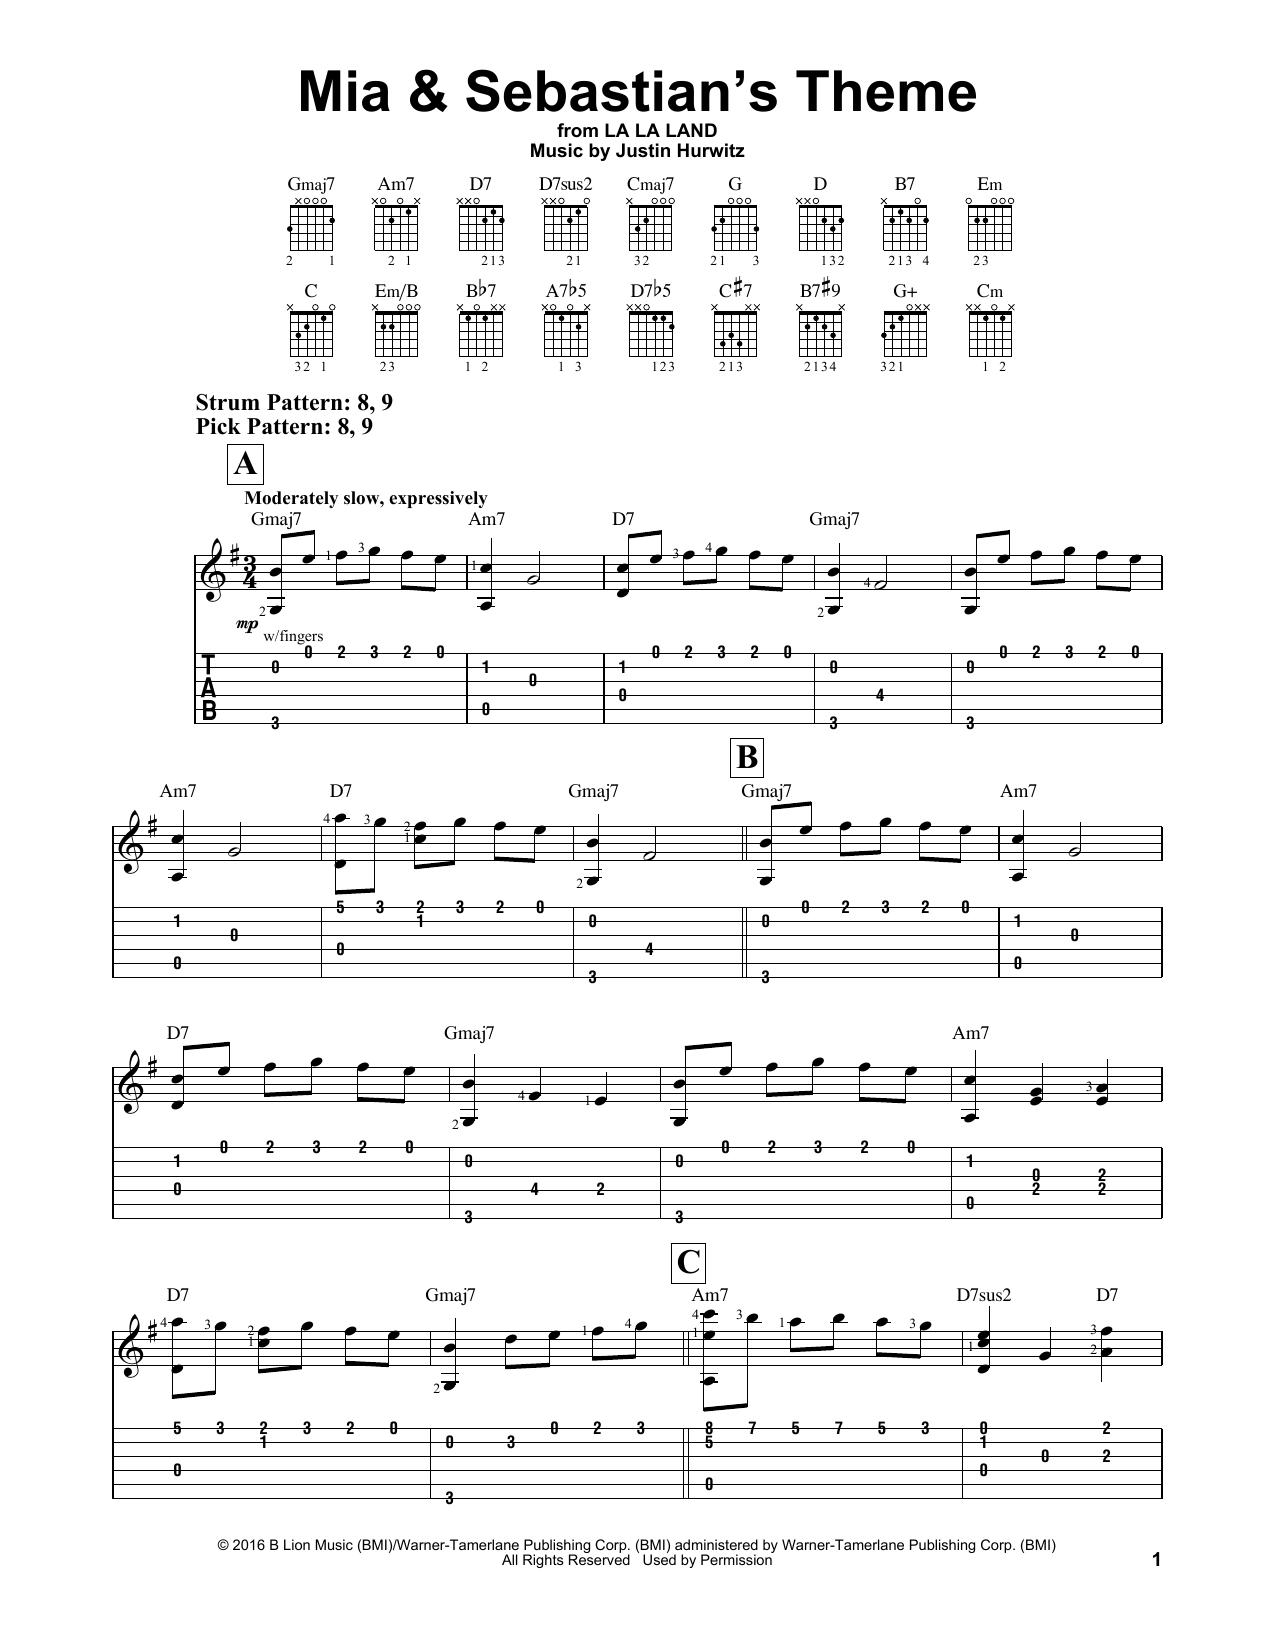 mia sebastian theme sheet music pdf